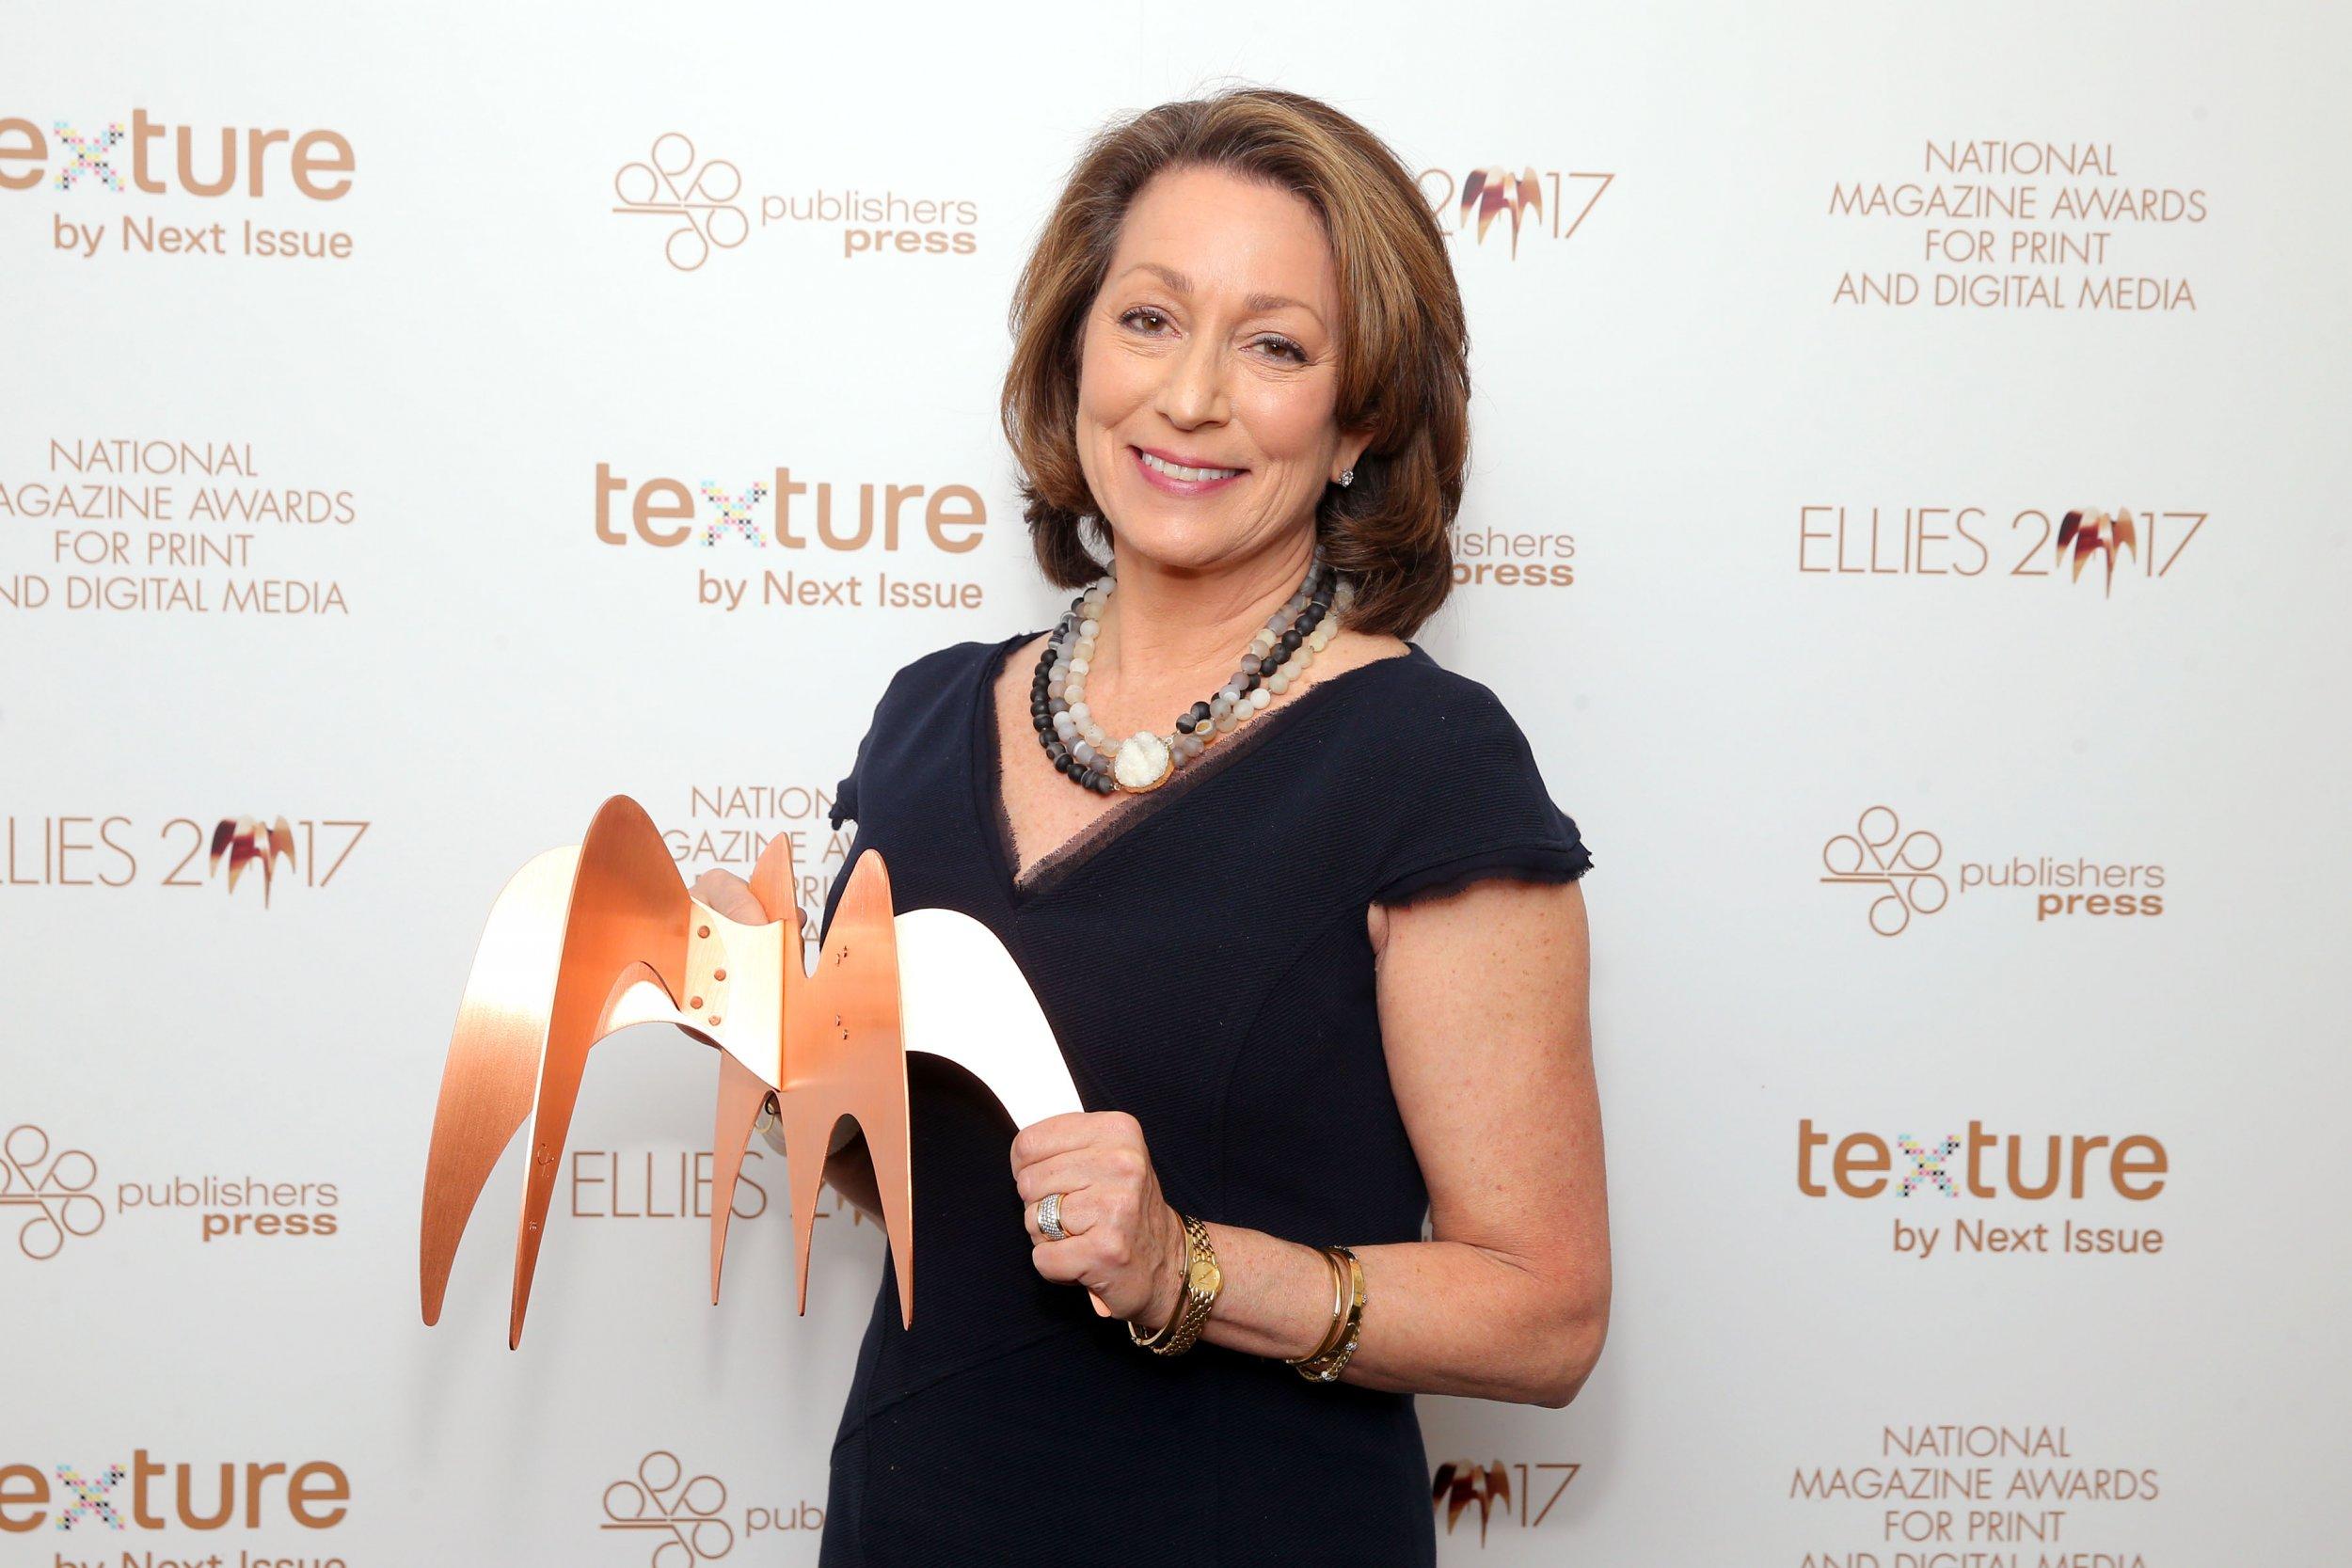 goldberg ellie awards